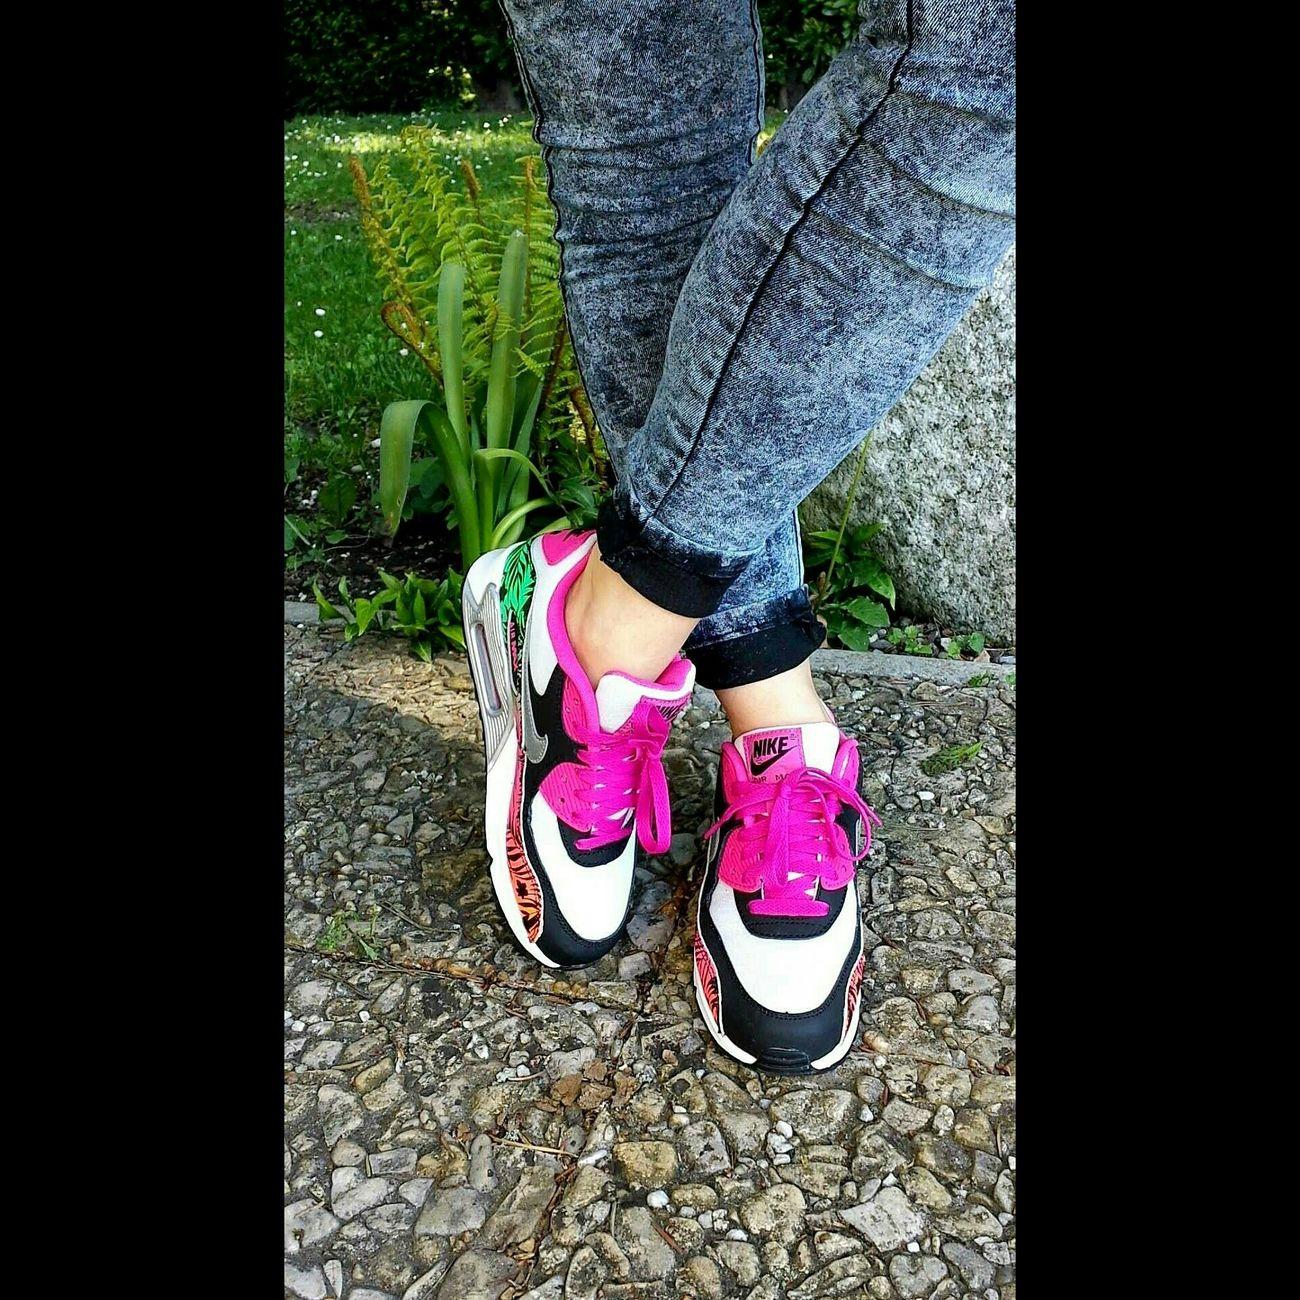 My hawaiian babe 🌺🌴🌞 Nike NikeAddict Streetstyle Nikeairmax Sneakers Nikesportswear Airmax90 Airmax Bleachedjeans Airmax90printgs